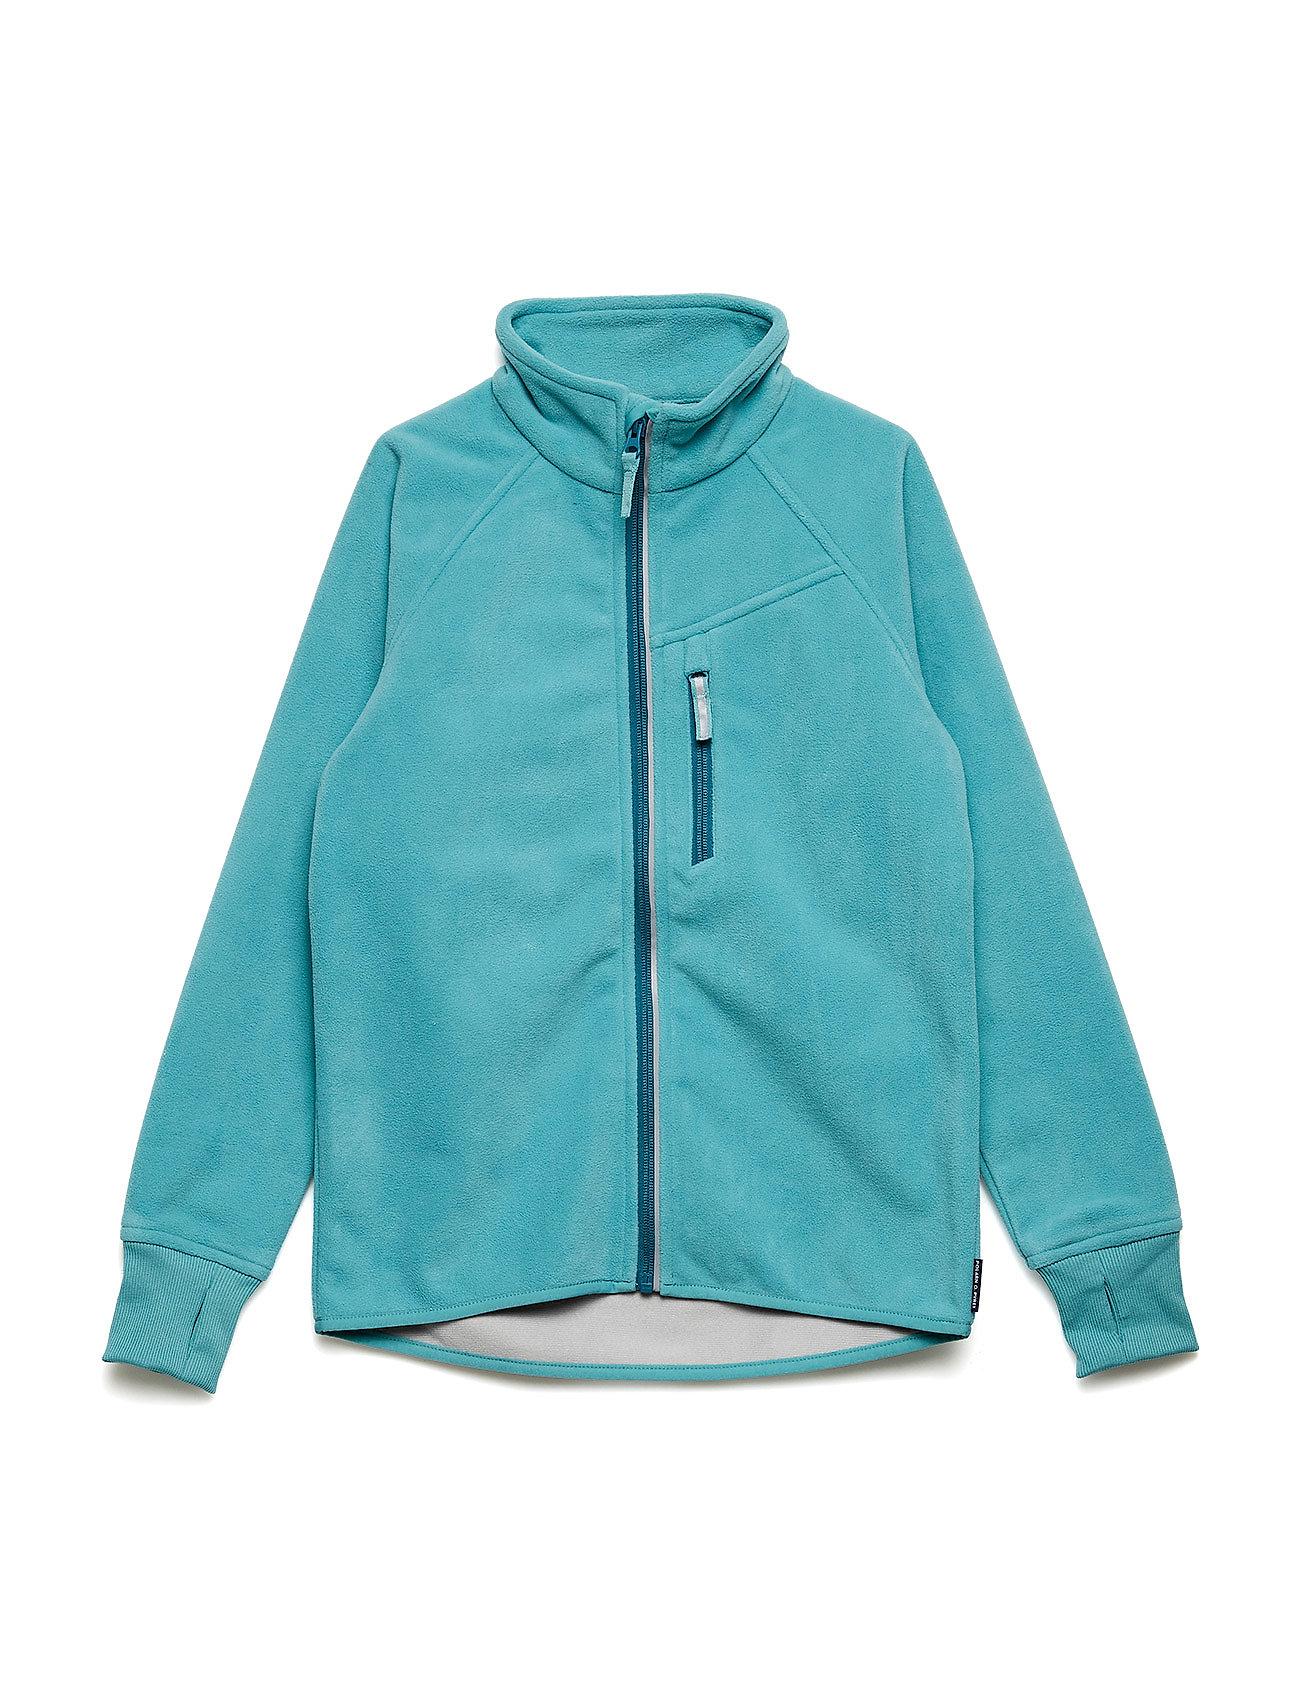 Polarn O. Pyret Jacket Windfleece Solid